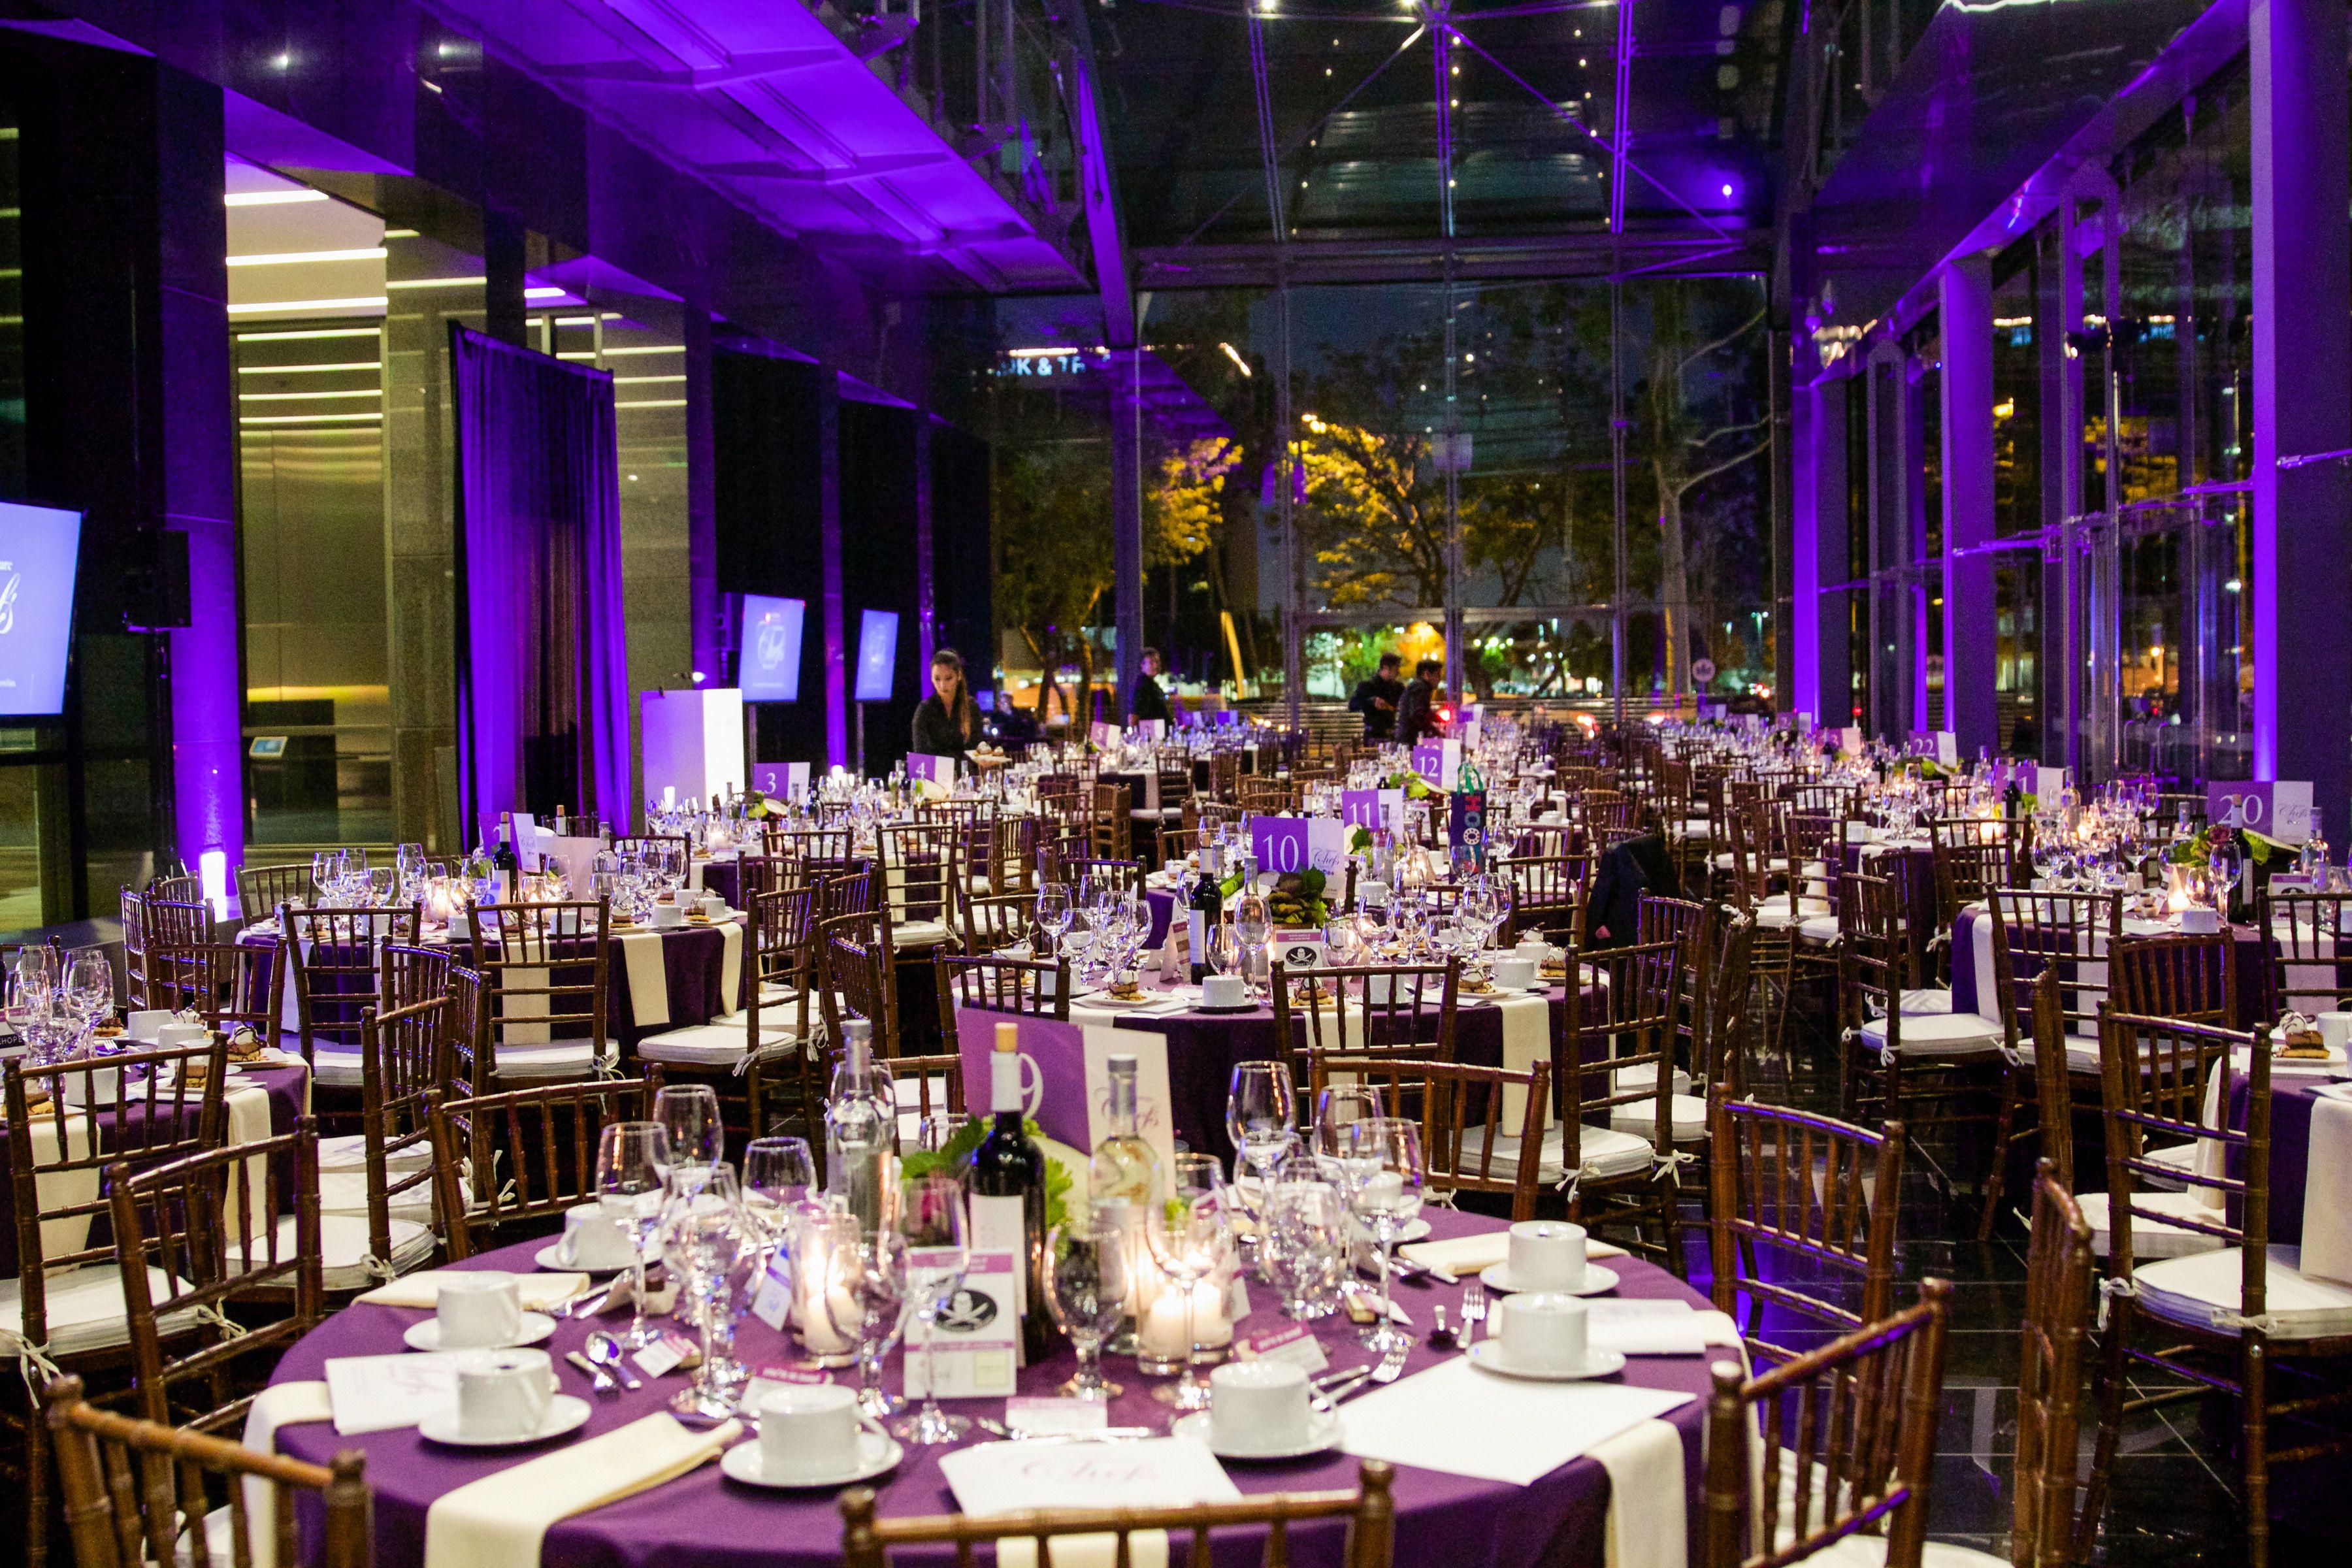 Signature party rentals wedding inspiration outdoor wedding signature party rentals wedding inspiration outdoor wedding party planning tablescape decor junglespirit Images